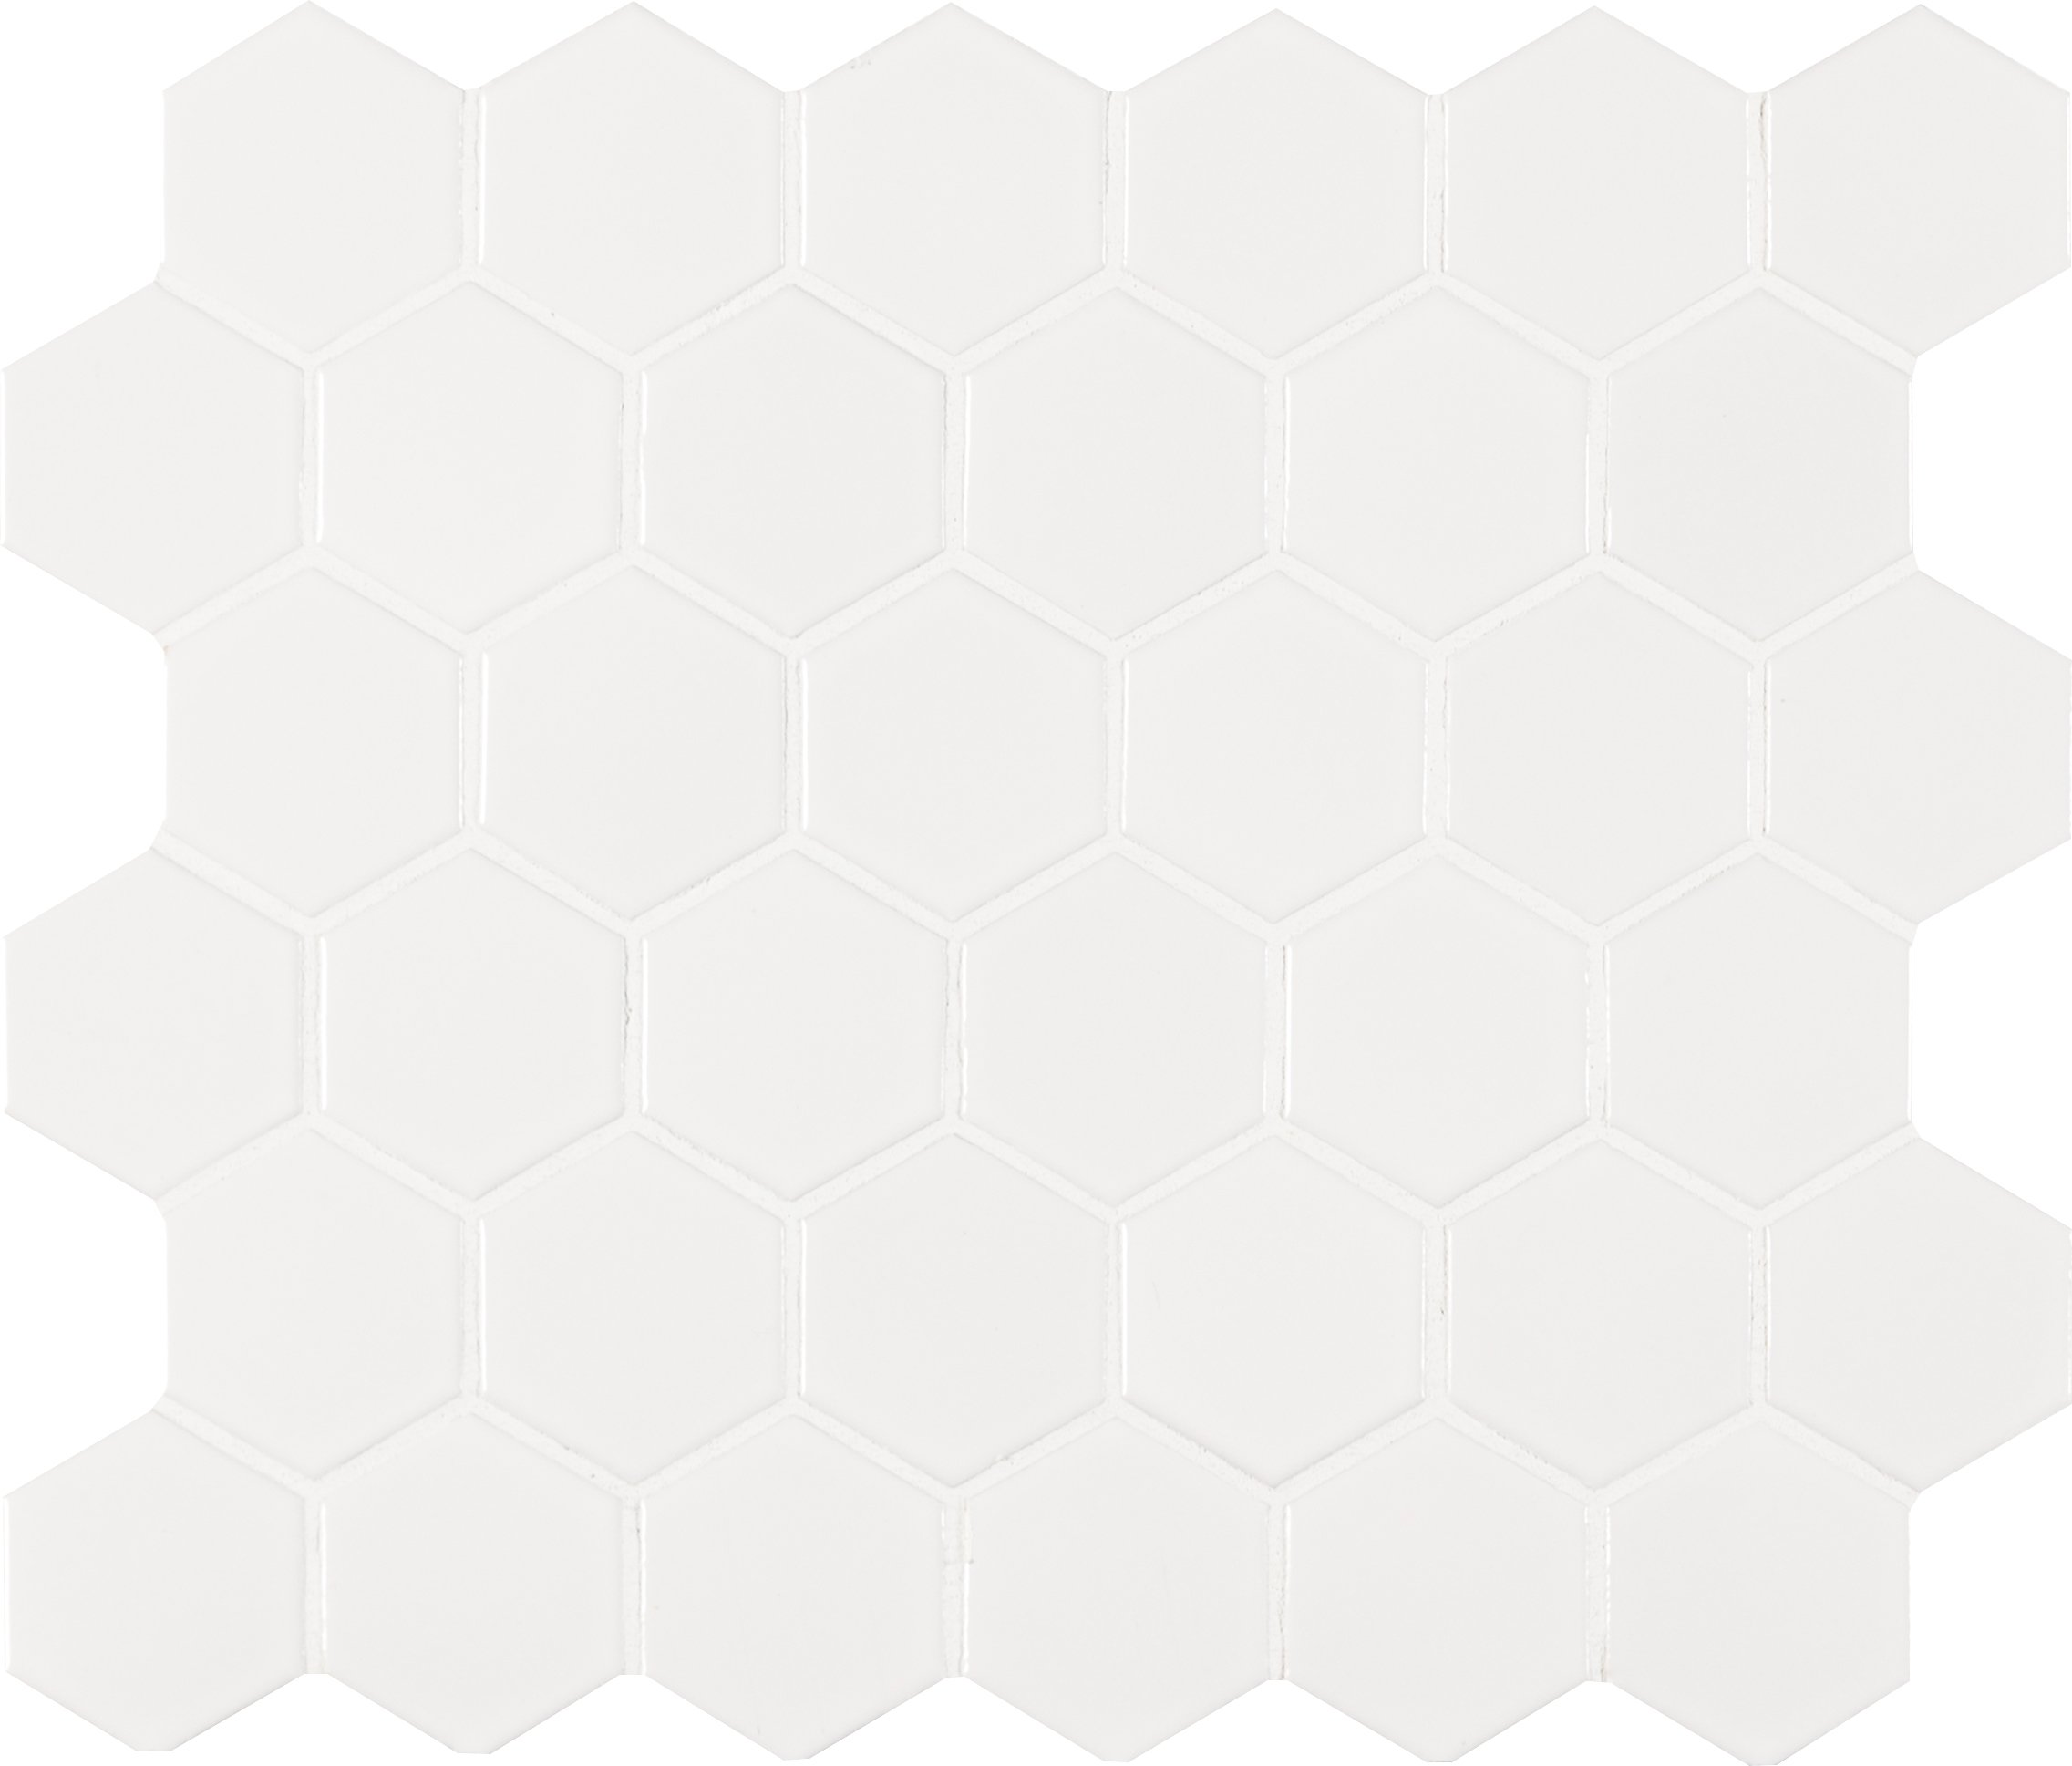 MS International AMZ-MD-00185 White Hexagon Tile, 10.875in. x 12.625in, 20 Piece